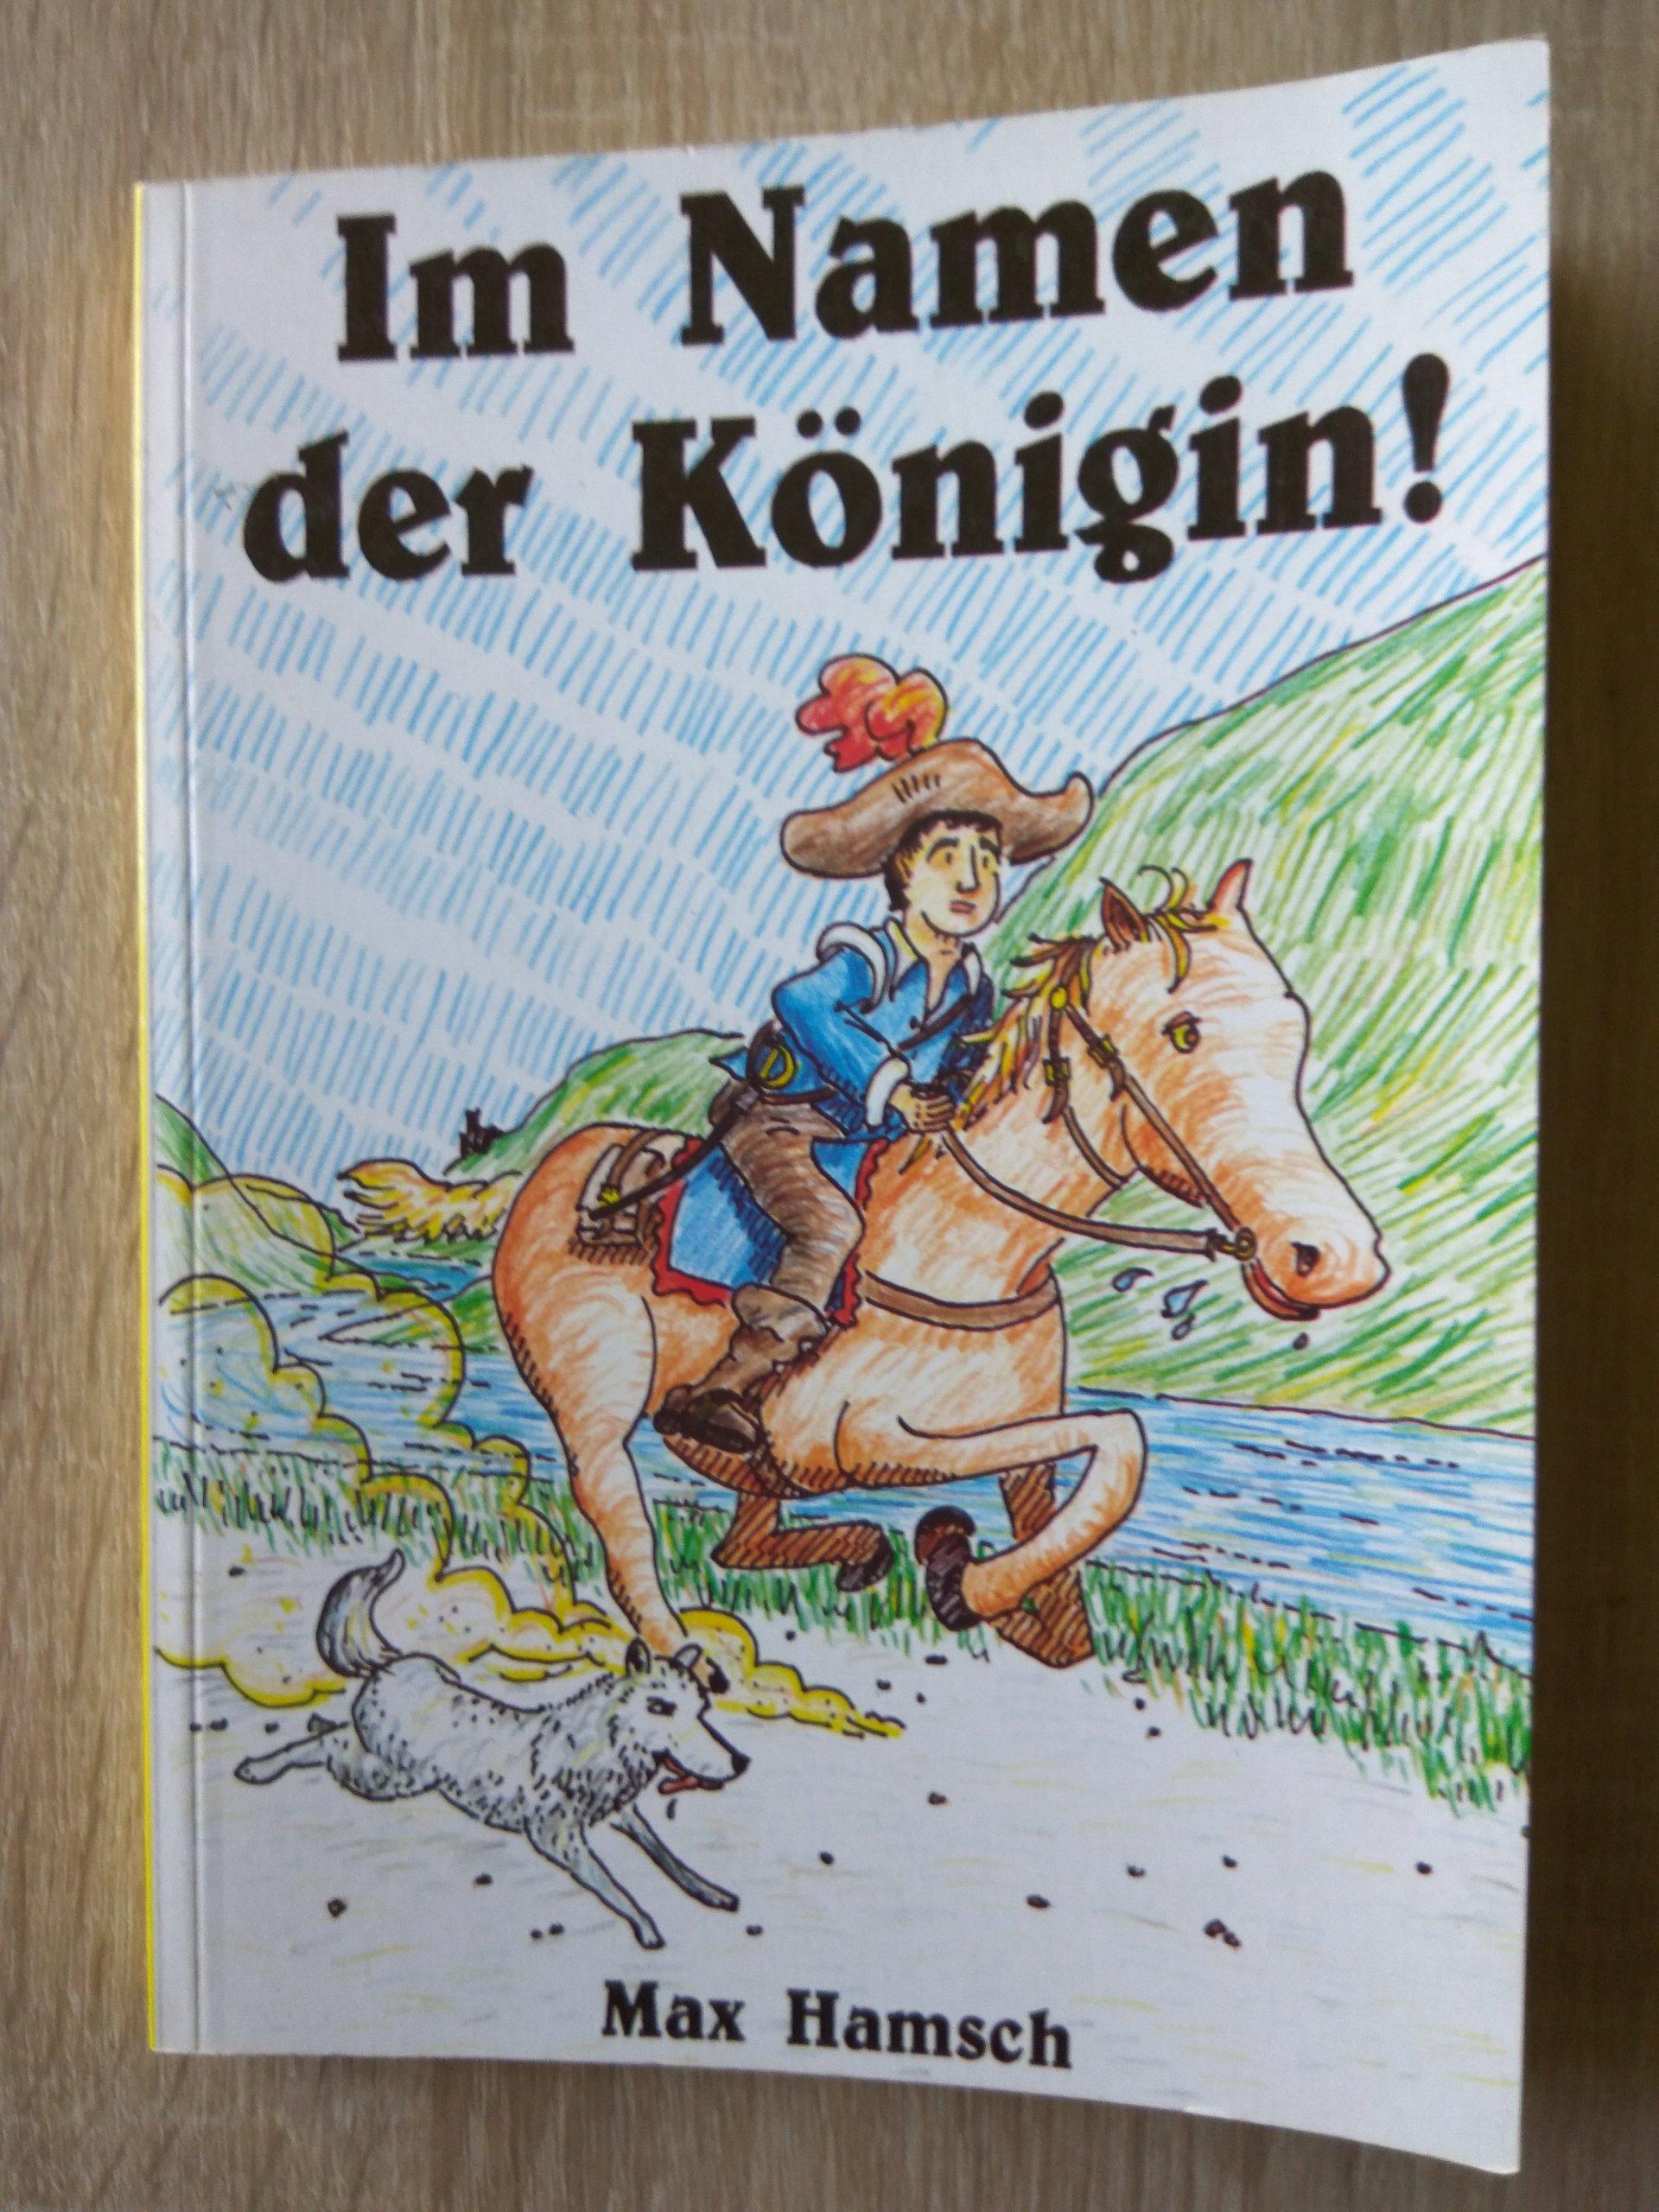 In Namen der Konigin Max Hamsch po niemiecku